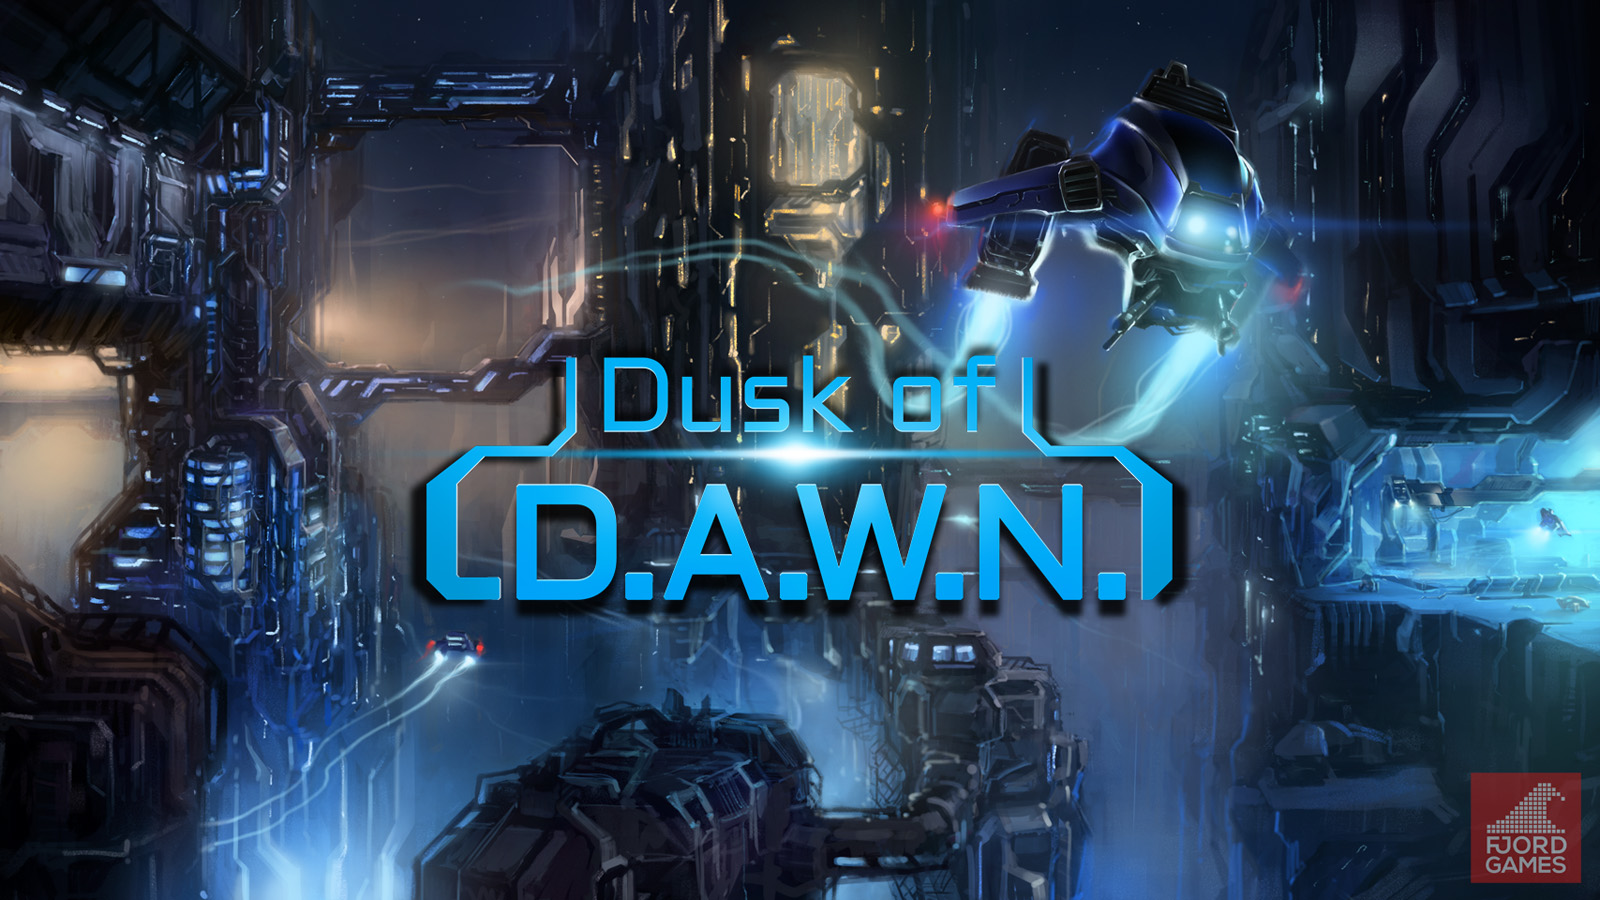 dusk-of-dawn_gametitle_promo